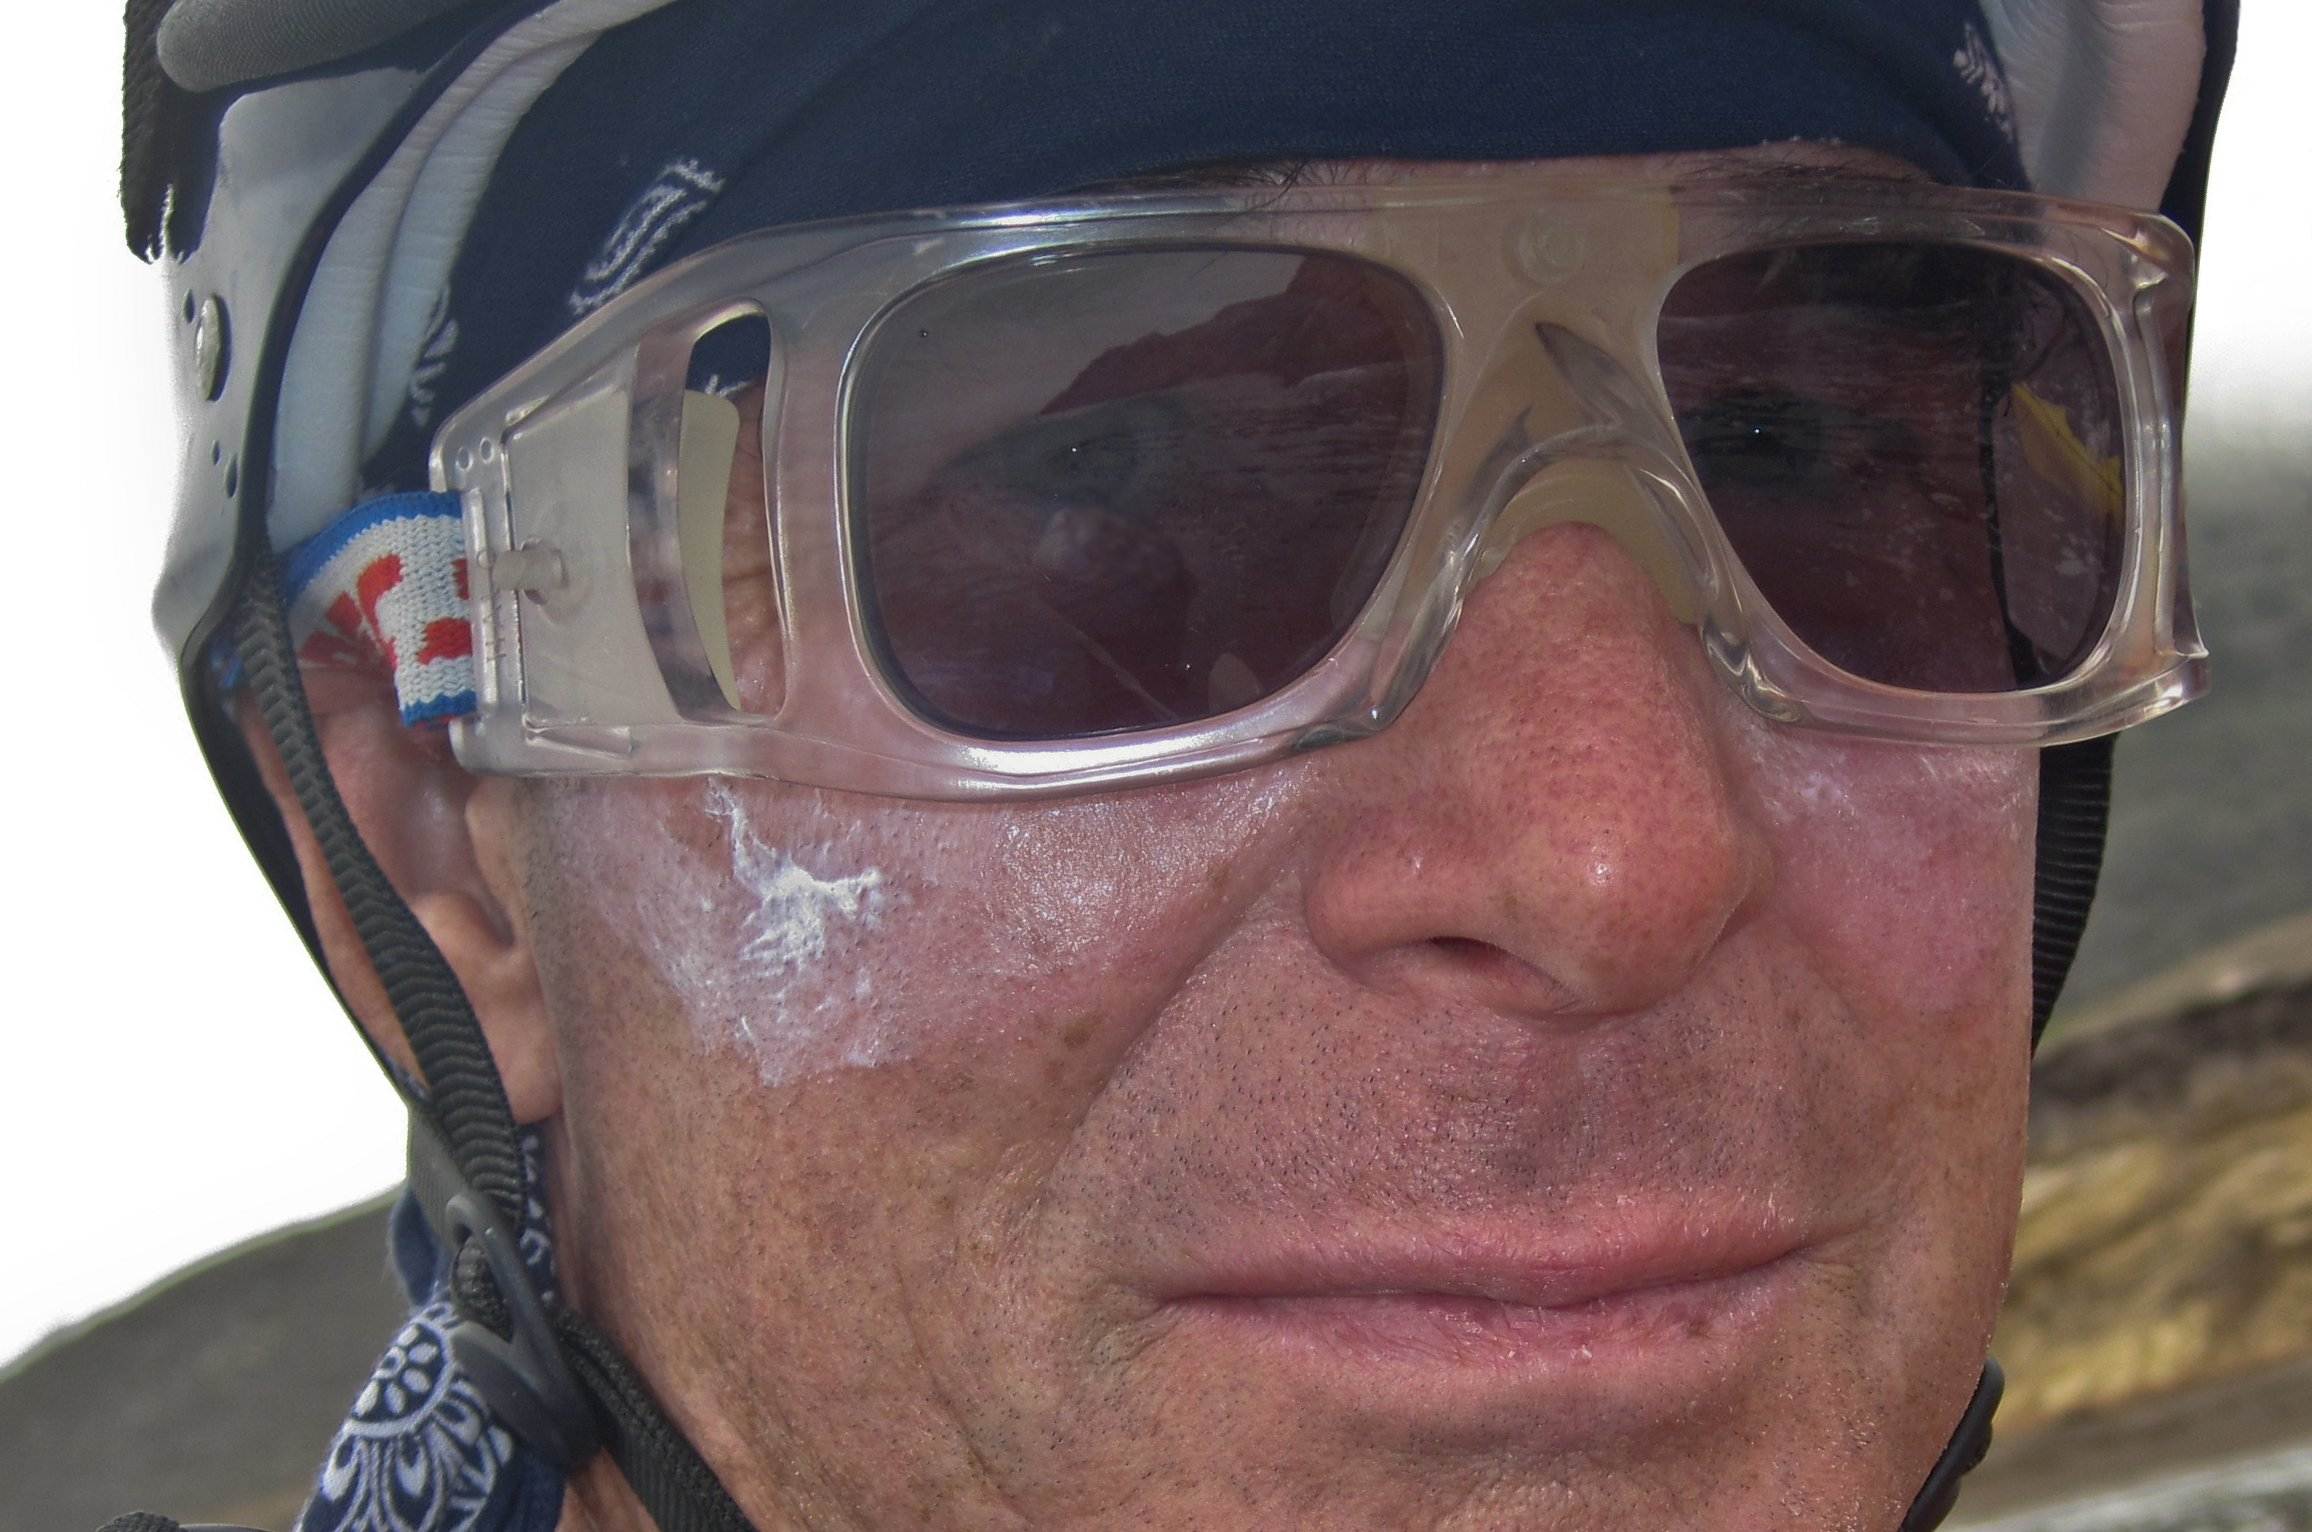 bc3e13c953 Sunglasses - Wikiwand